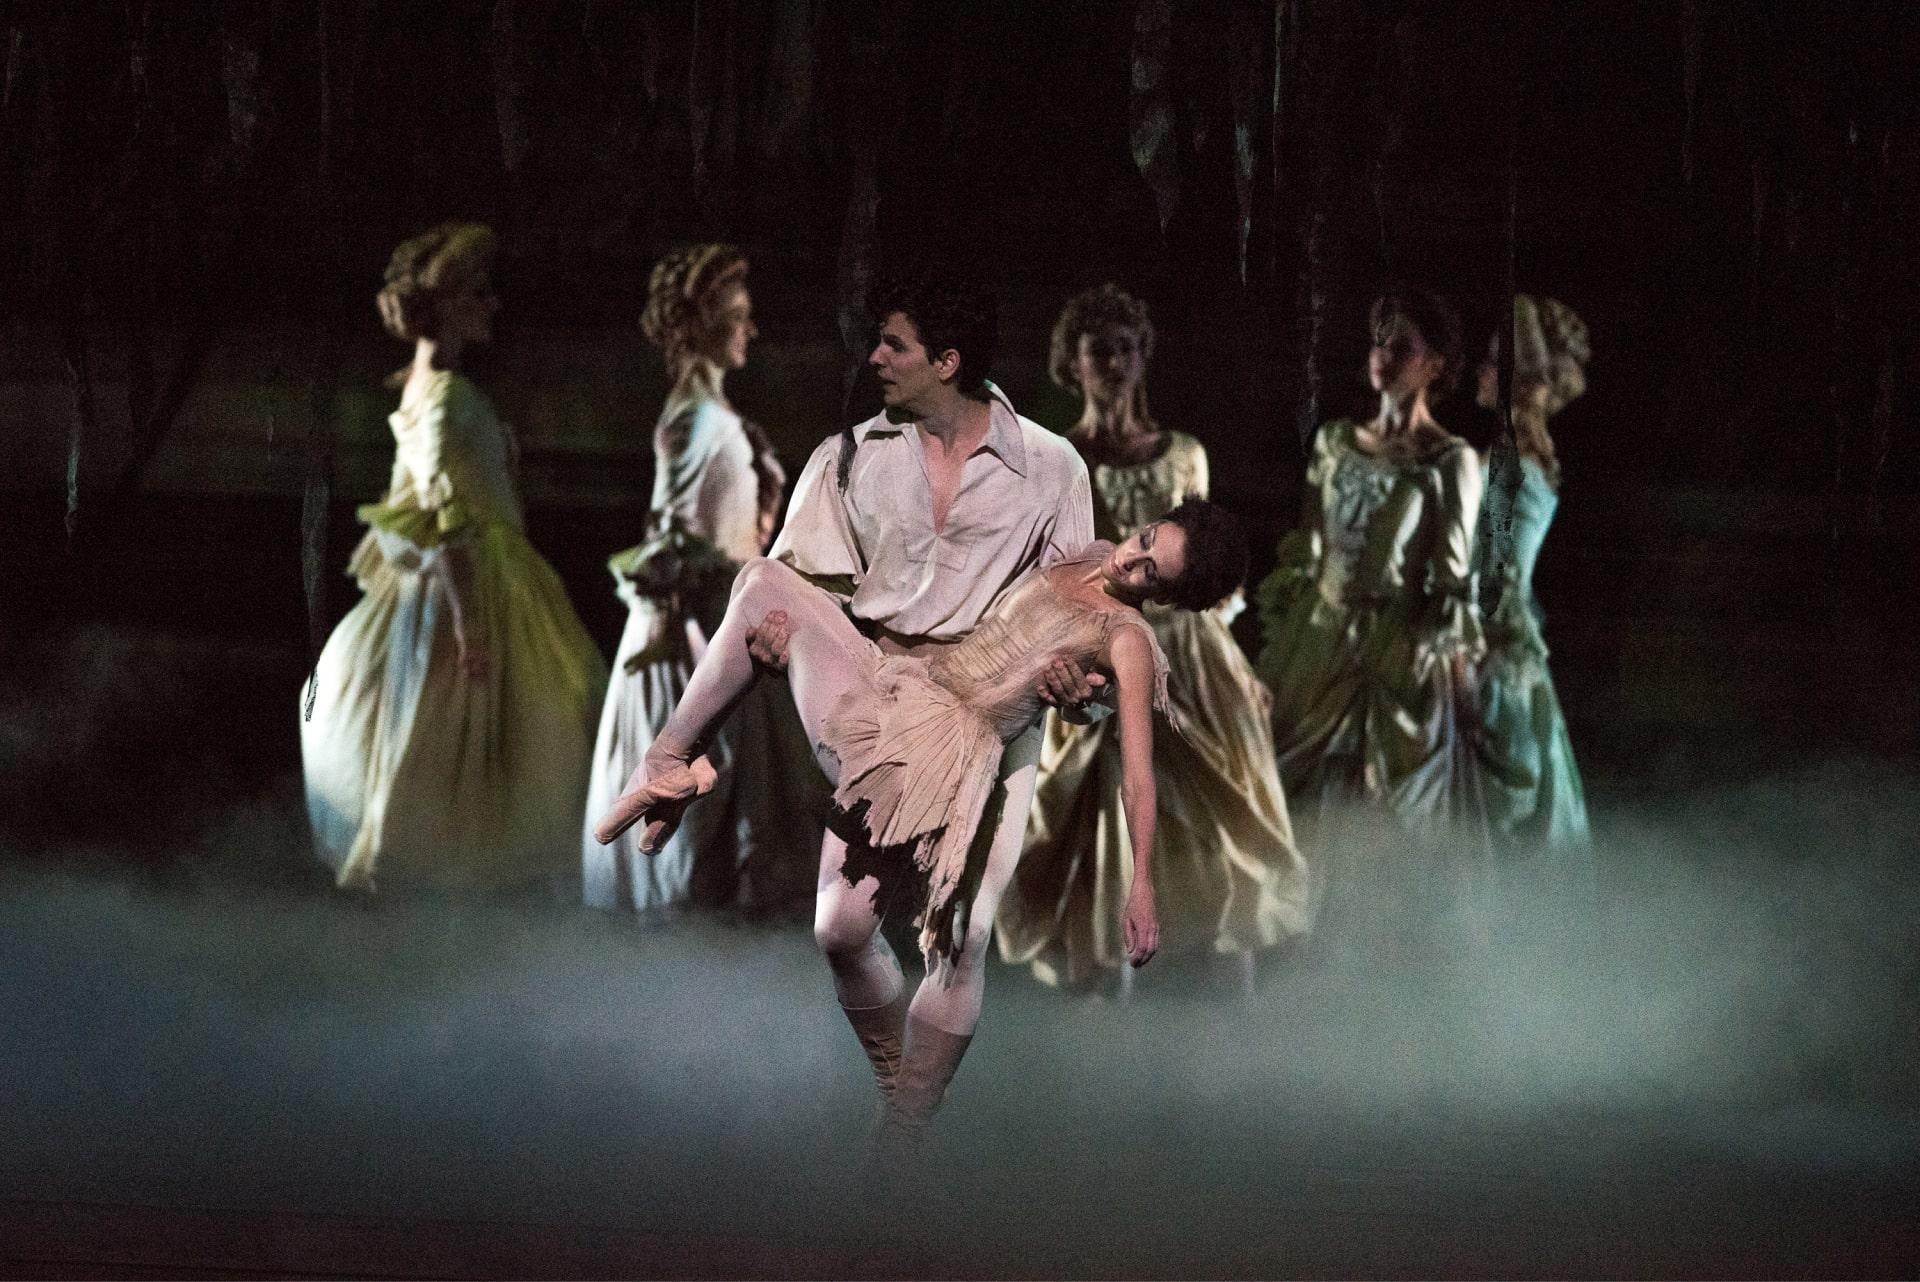 Dancer in white carries unconscious ballerina through dense fog away from elegant chorus.